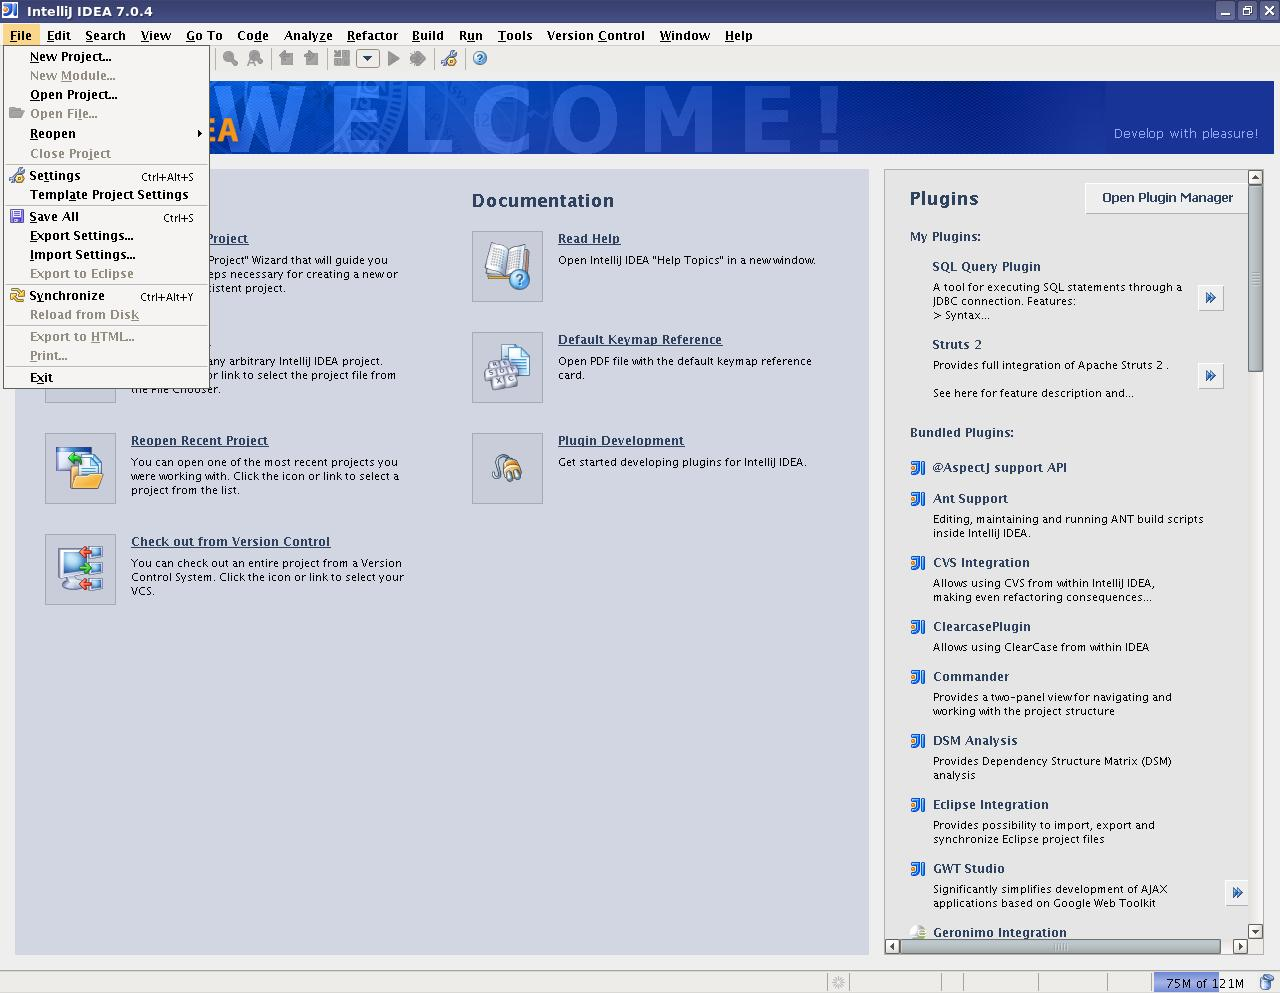 Configuring IntelliJ IDEA with Application Server